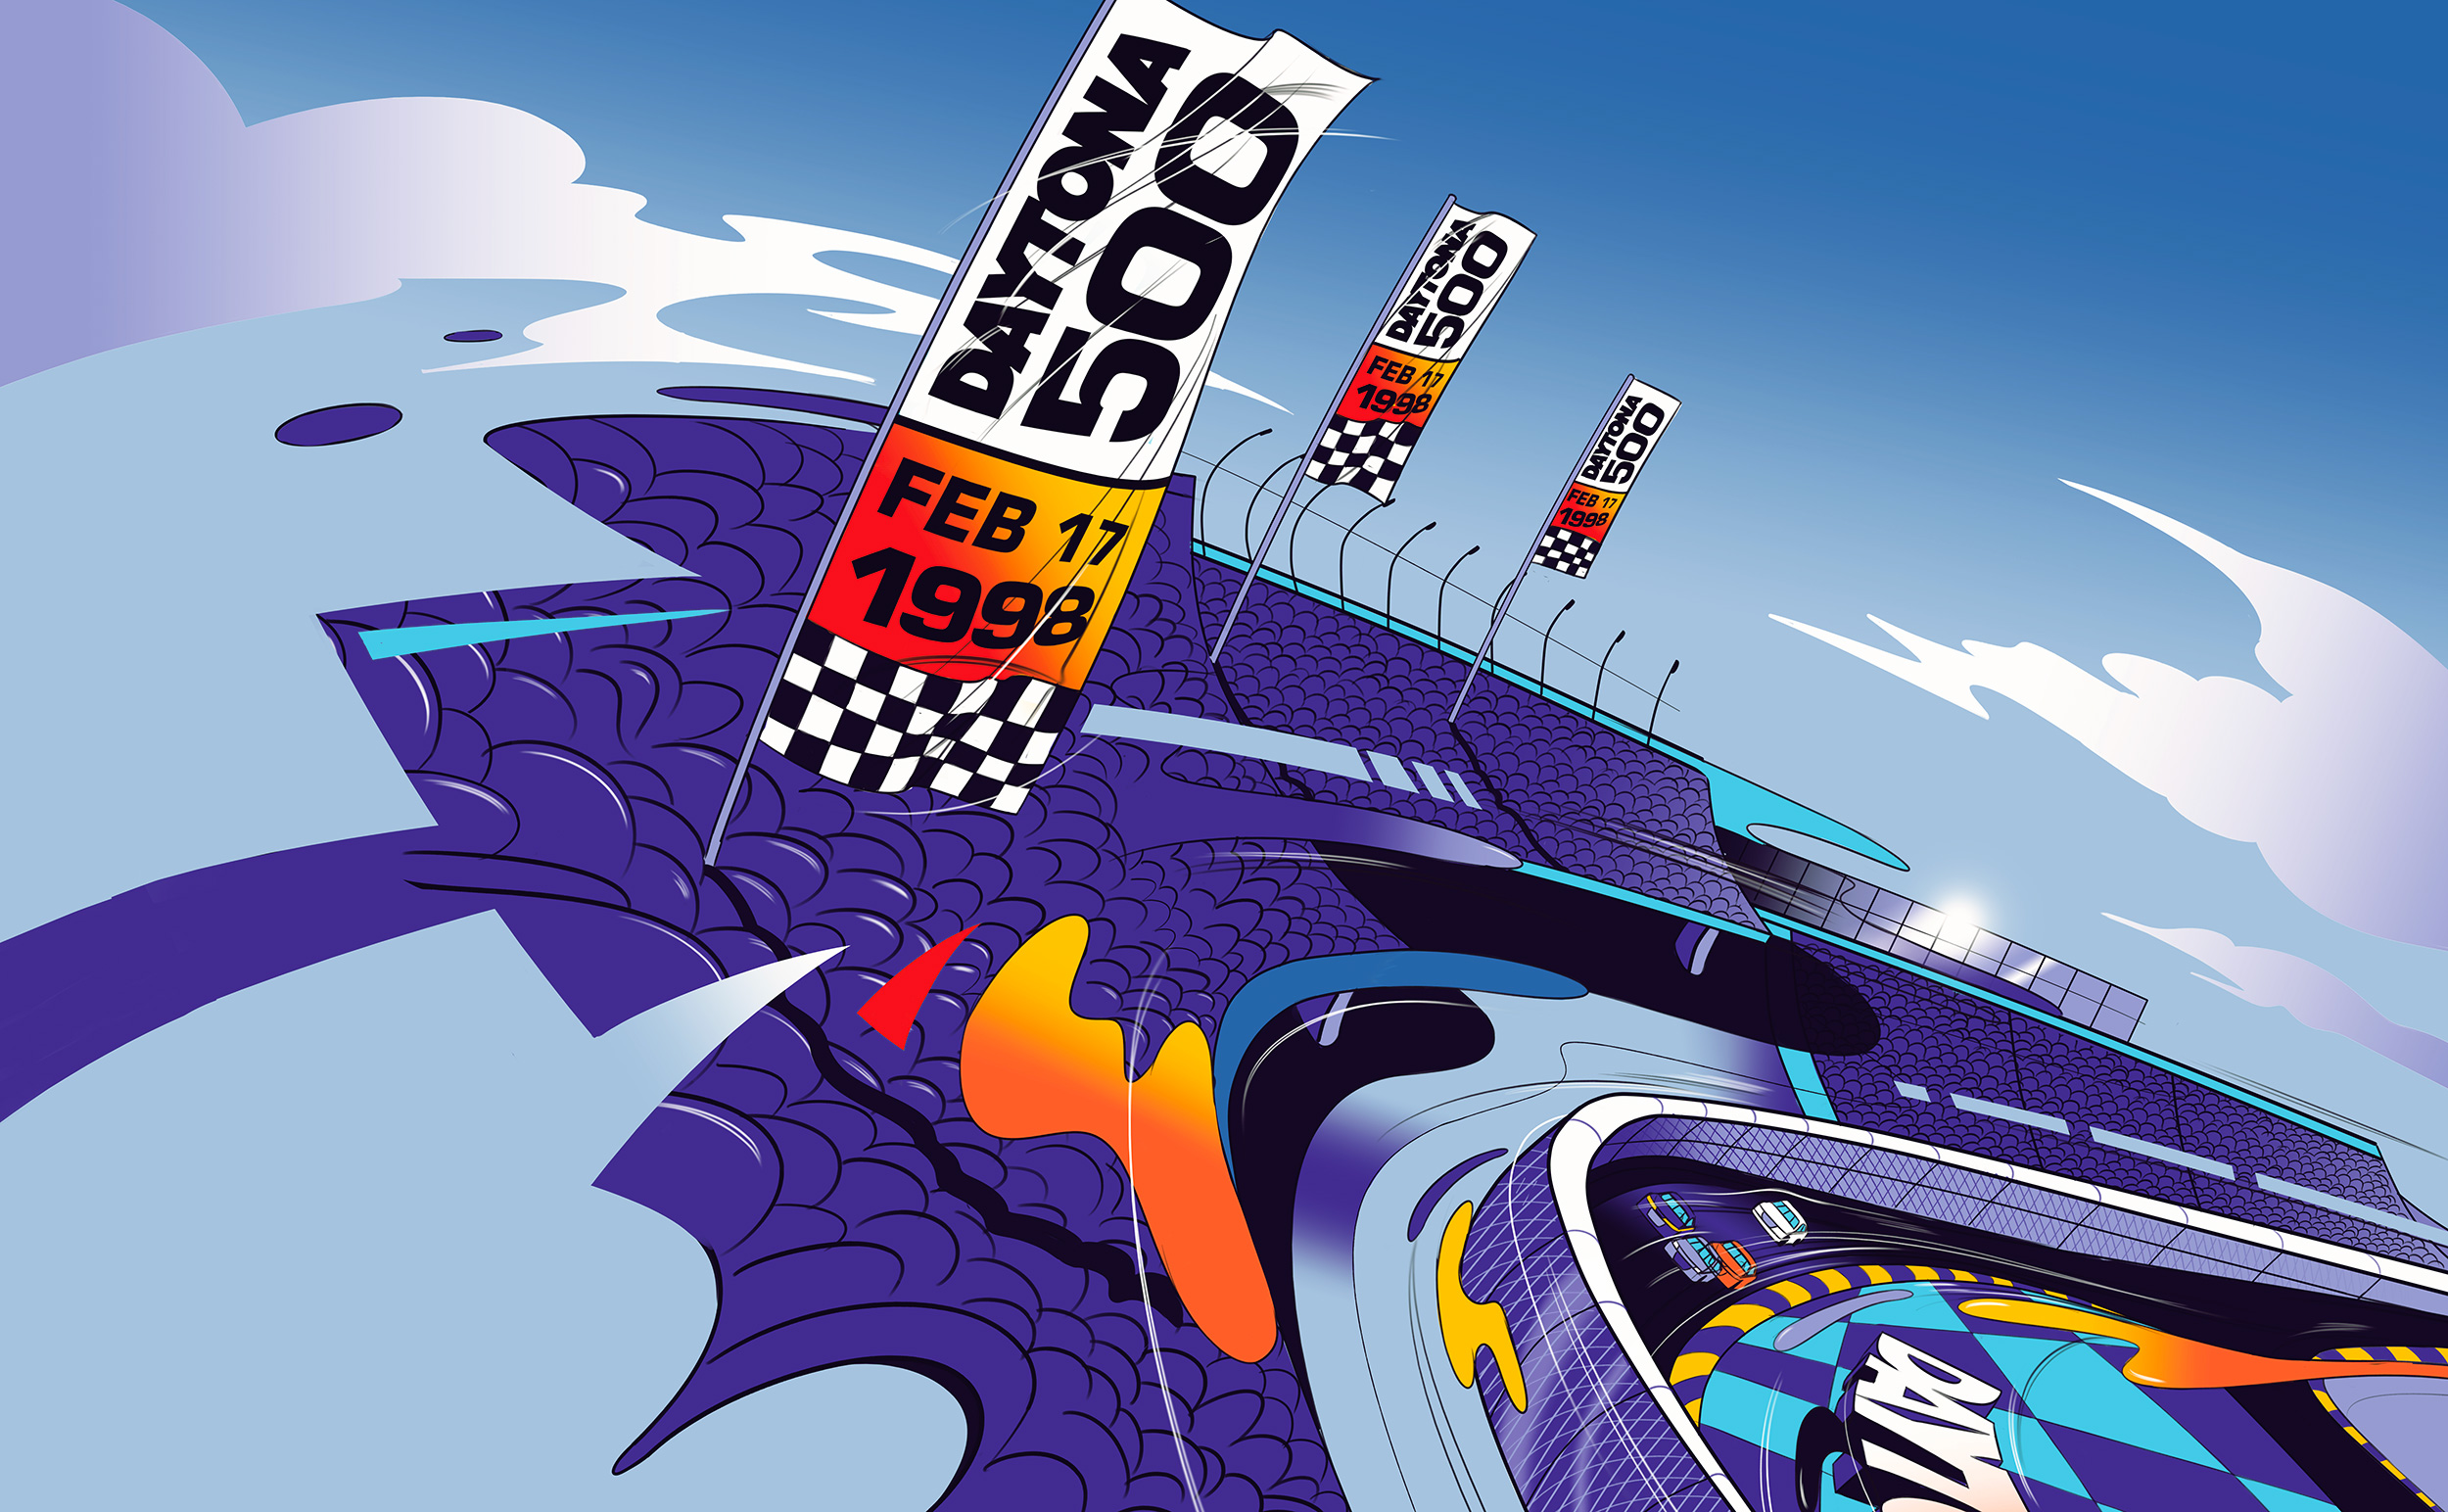 Nascar Daytona — Animated TV Commercial